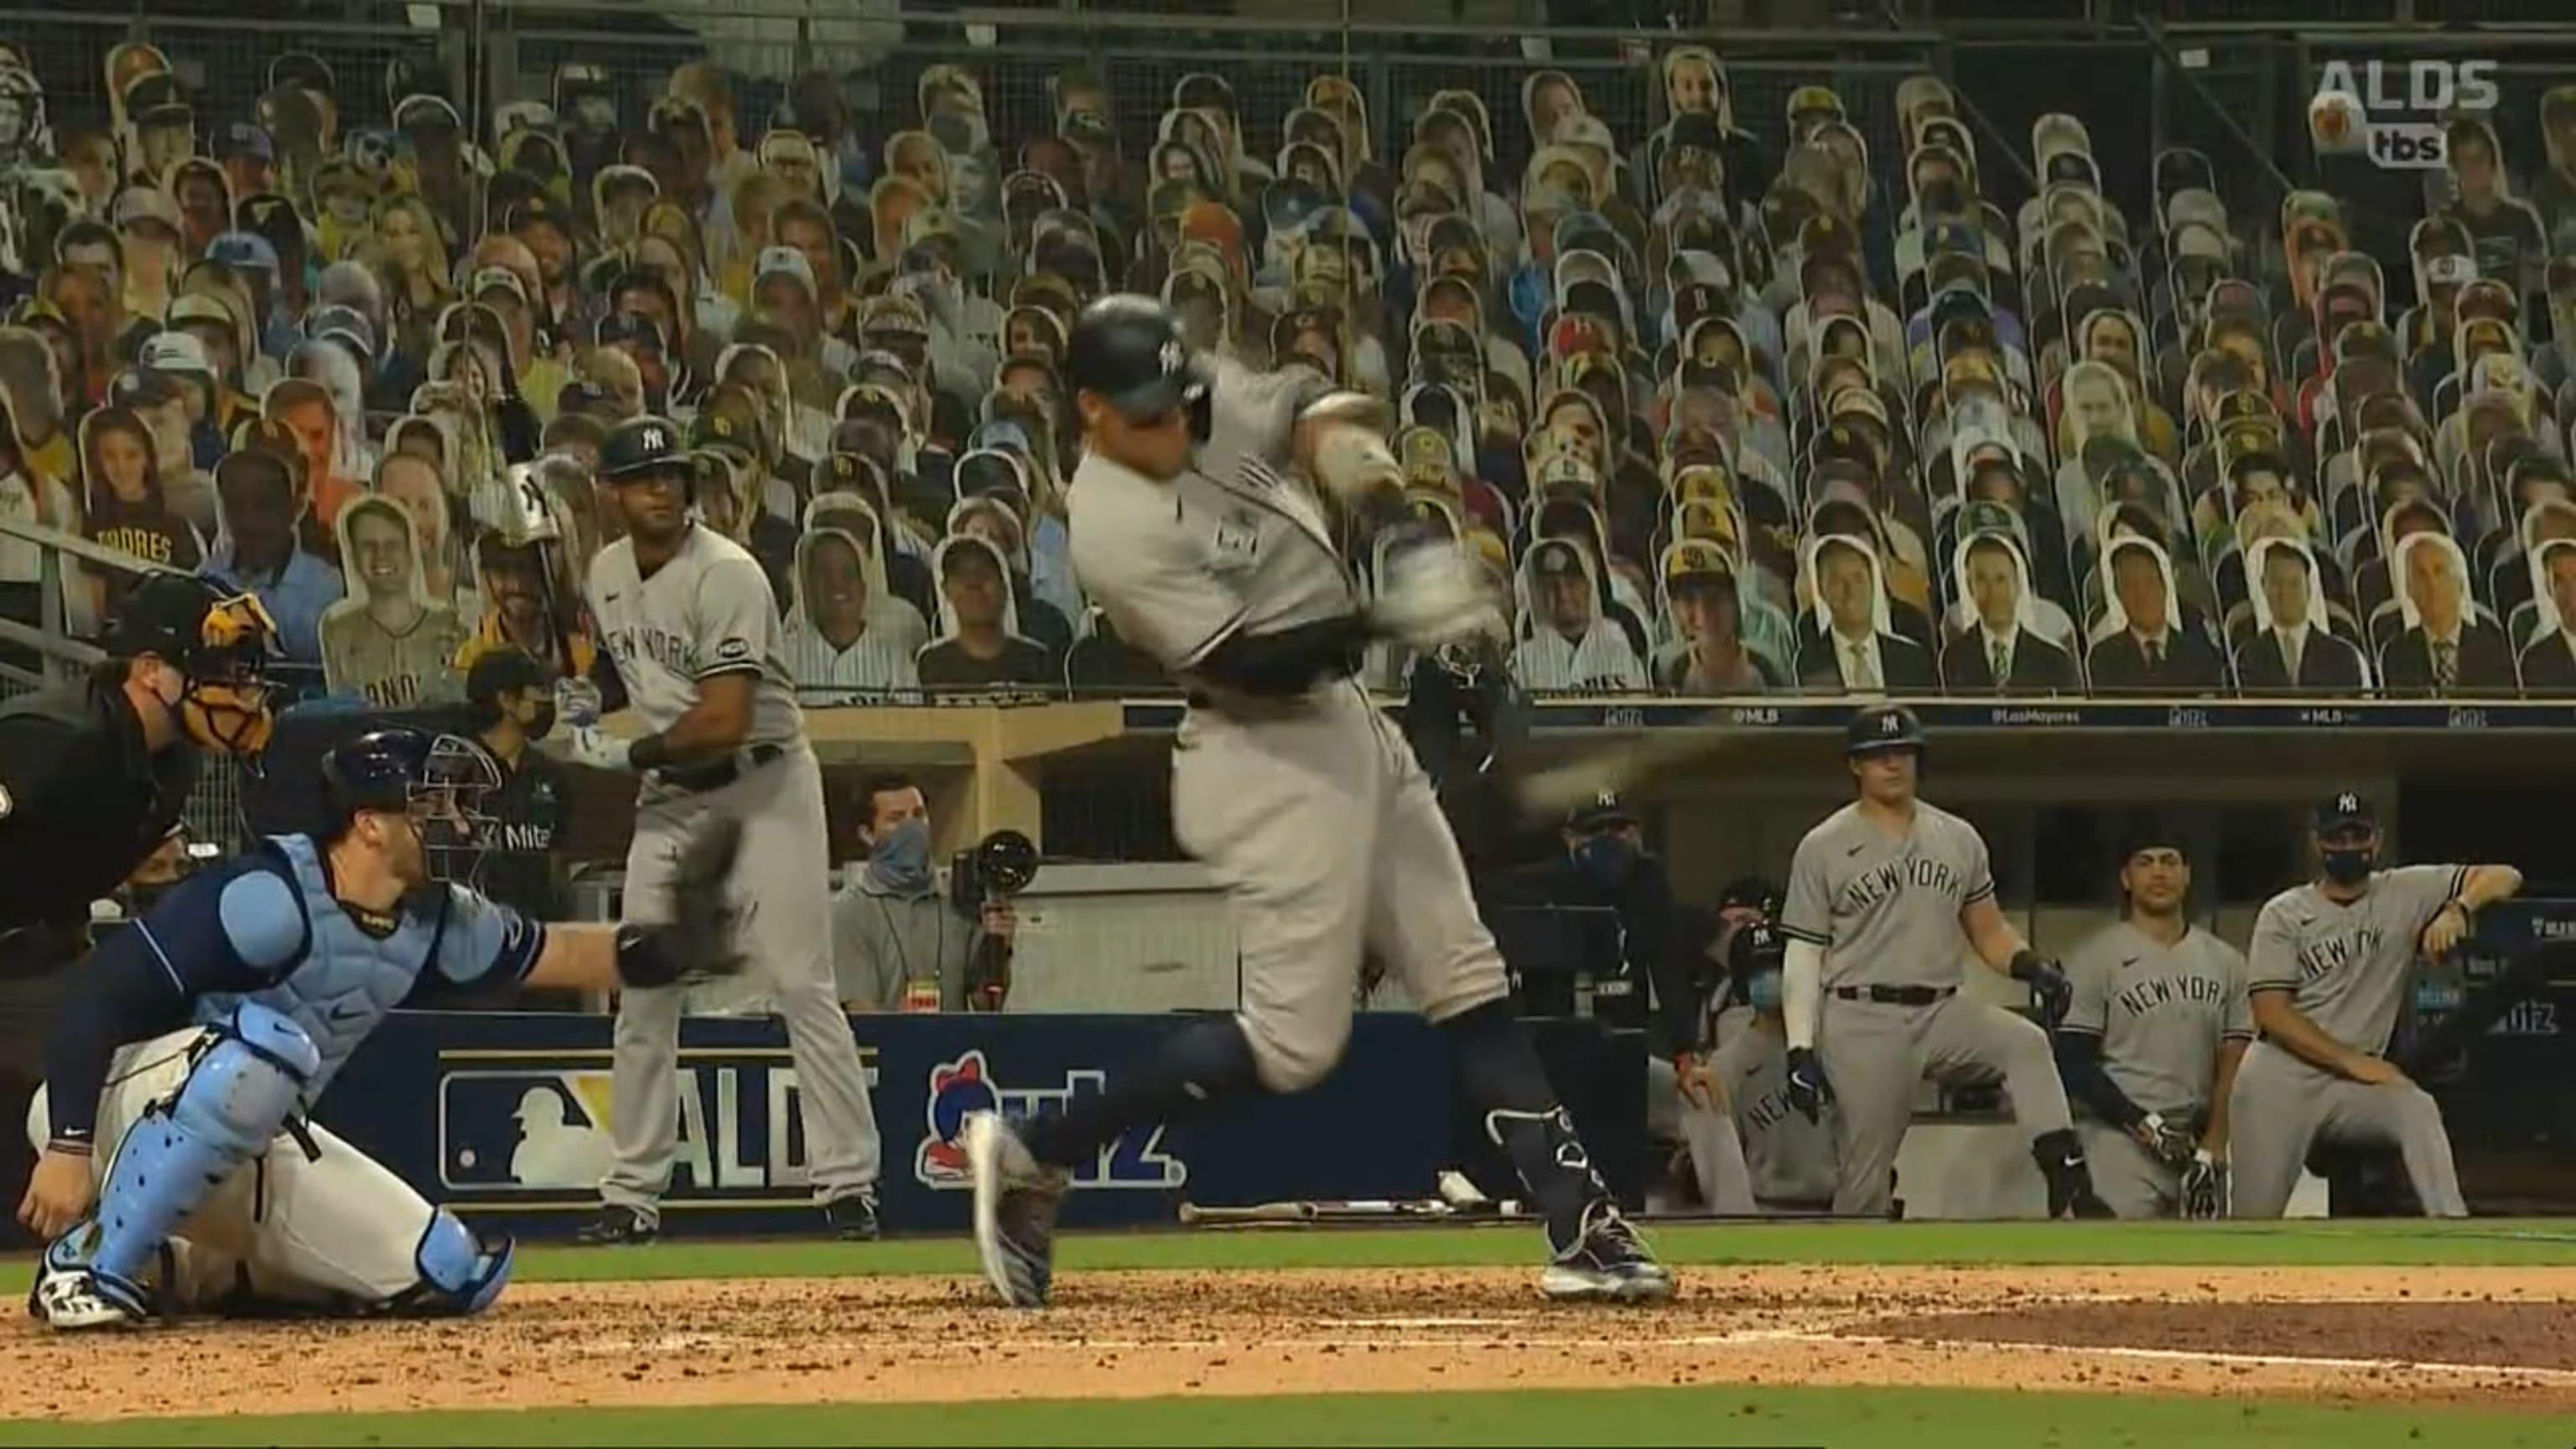 Aaron Judge's solo home run